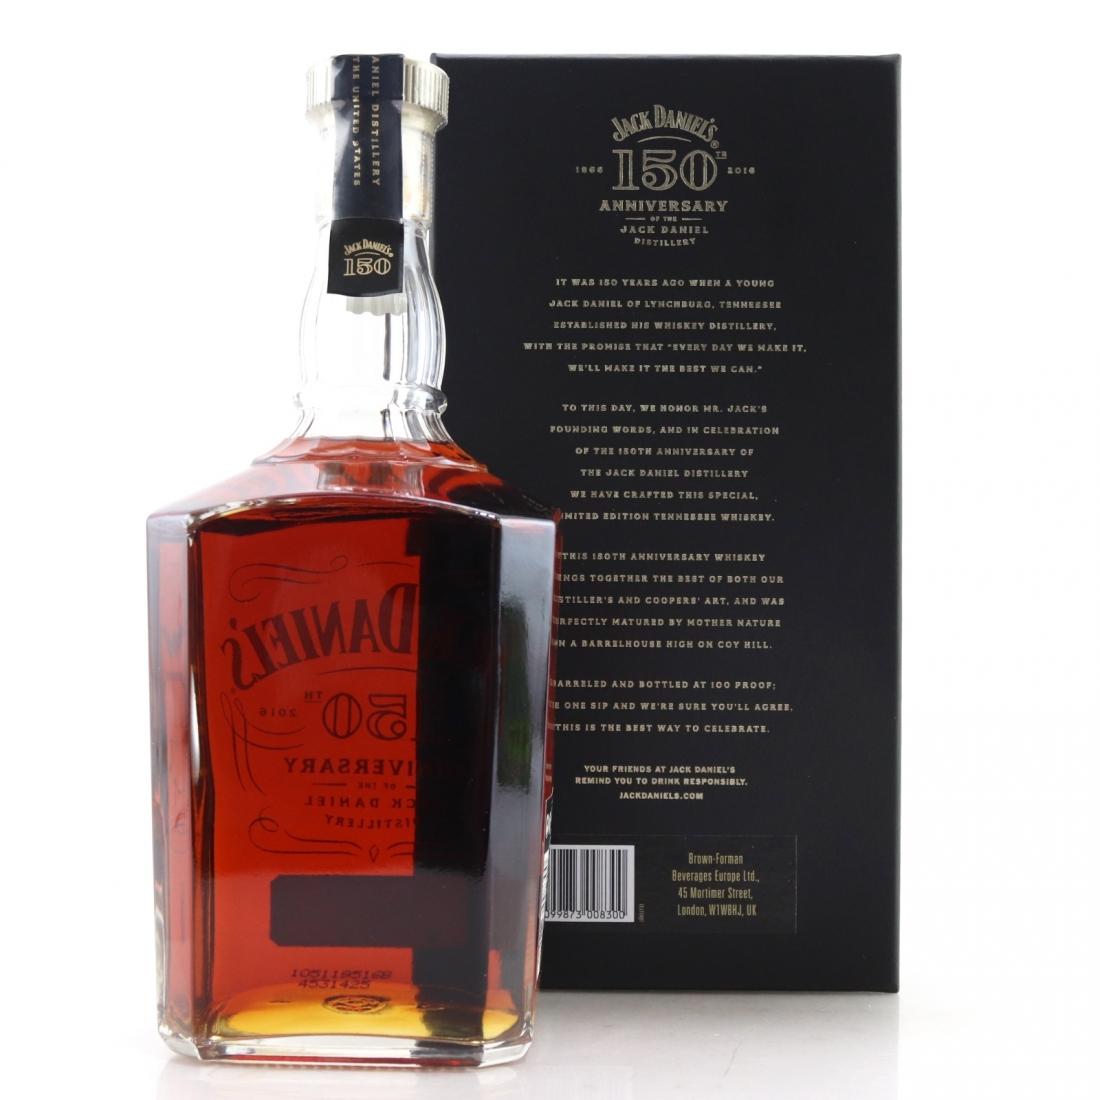 Jack Daniel's 150th Anniversary 100 Proof 1 Litre